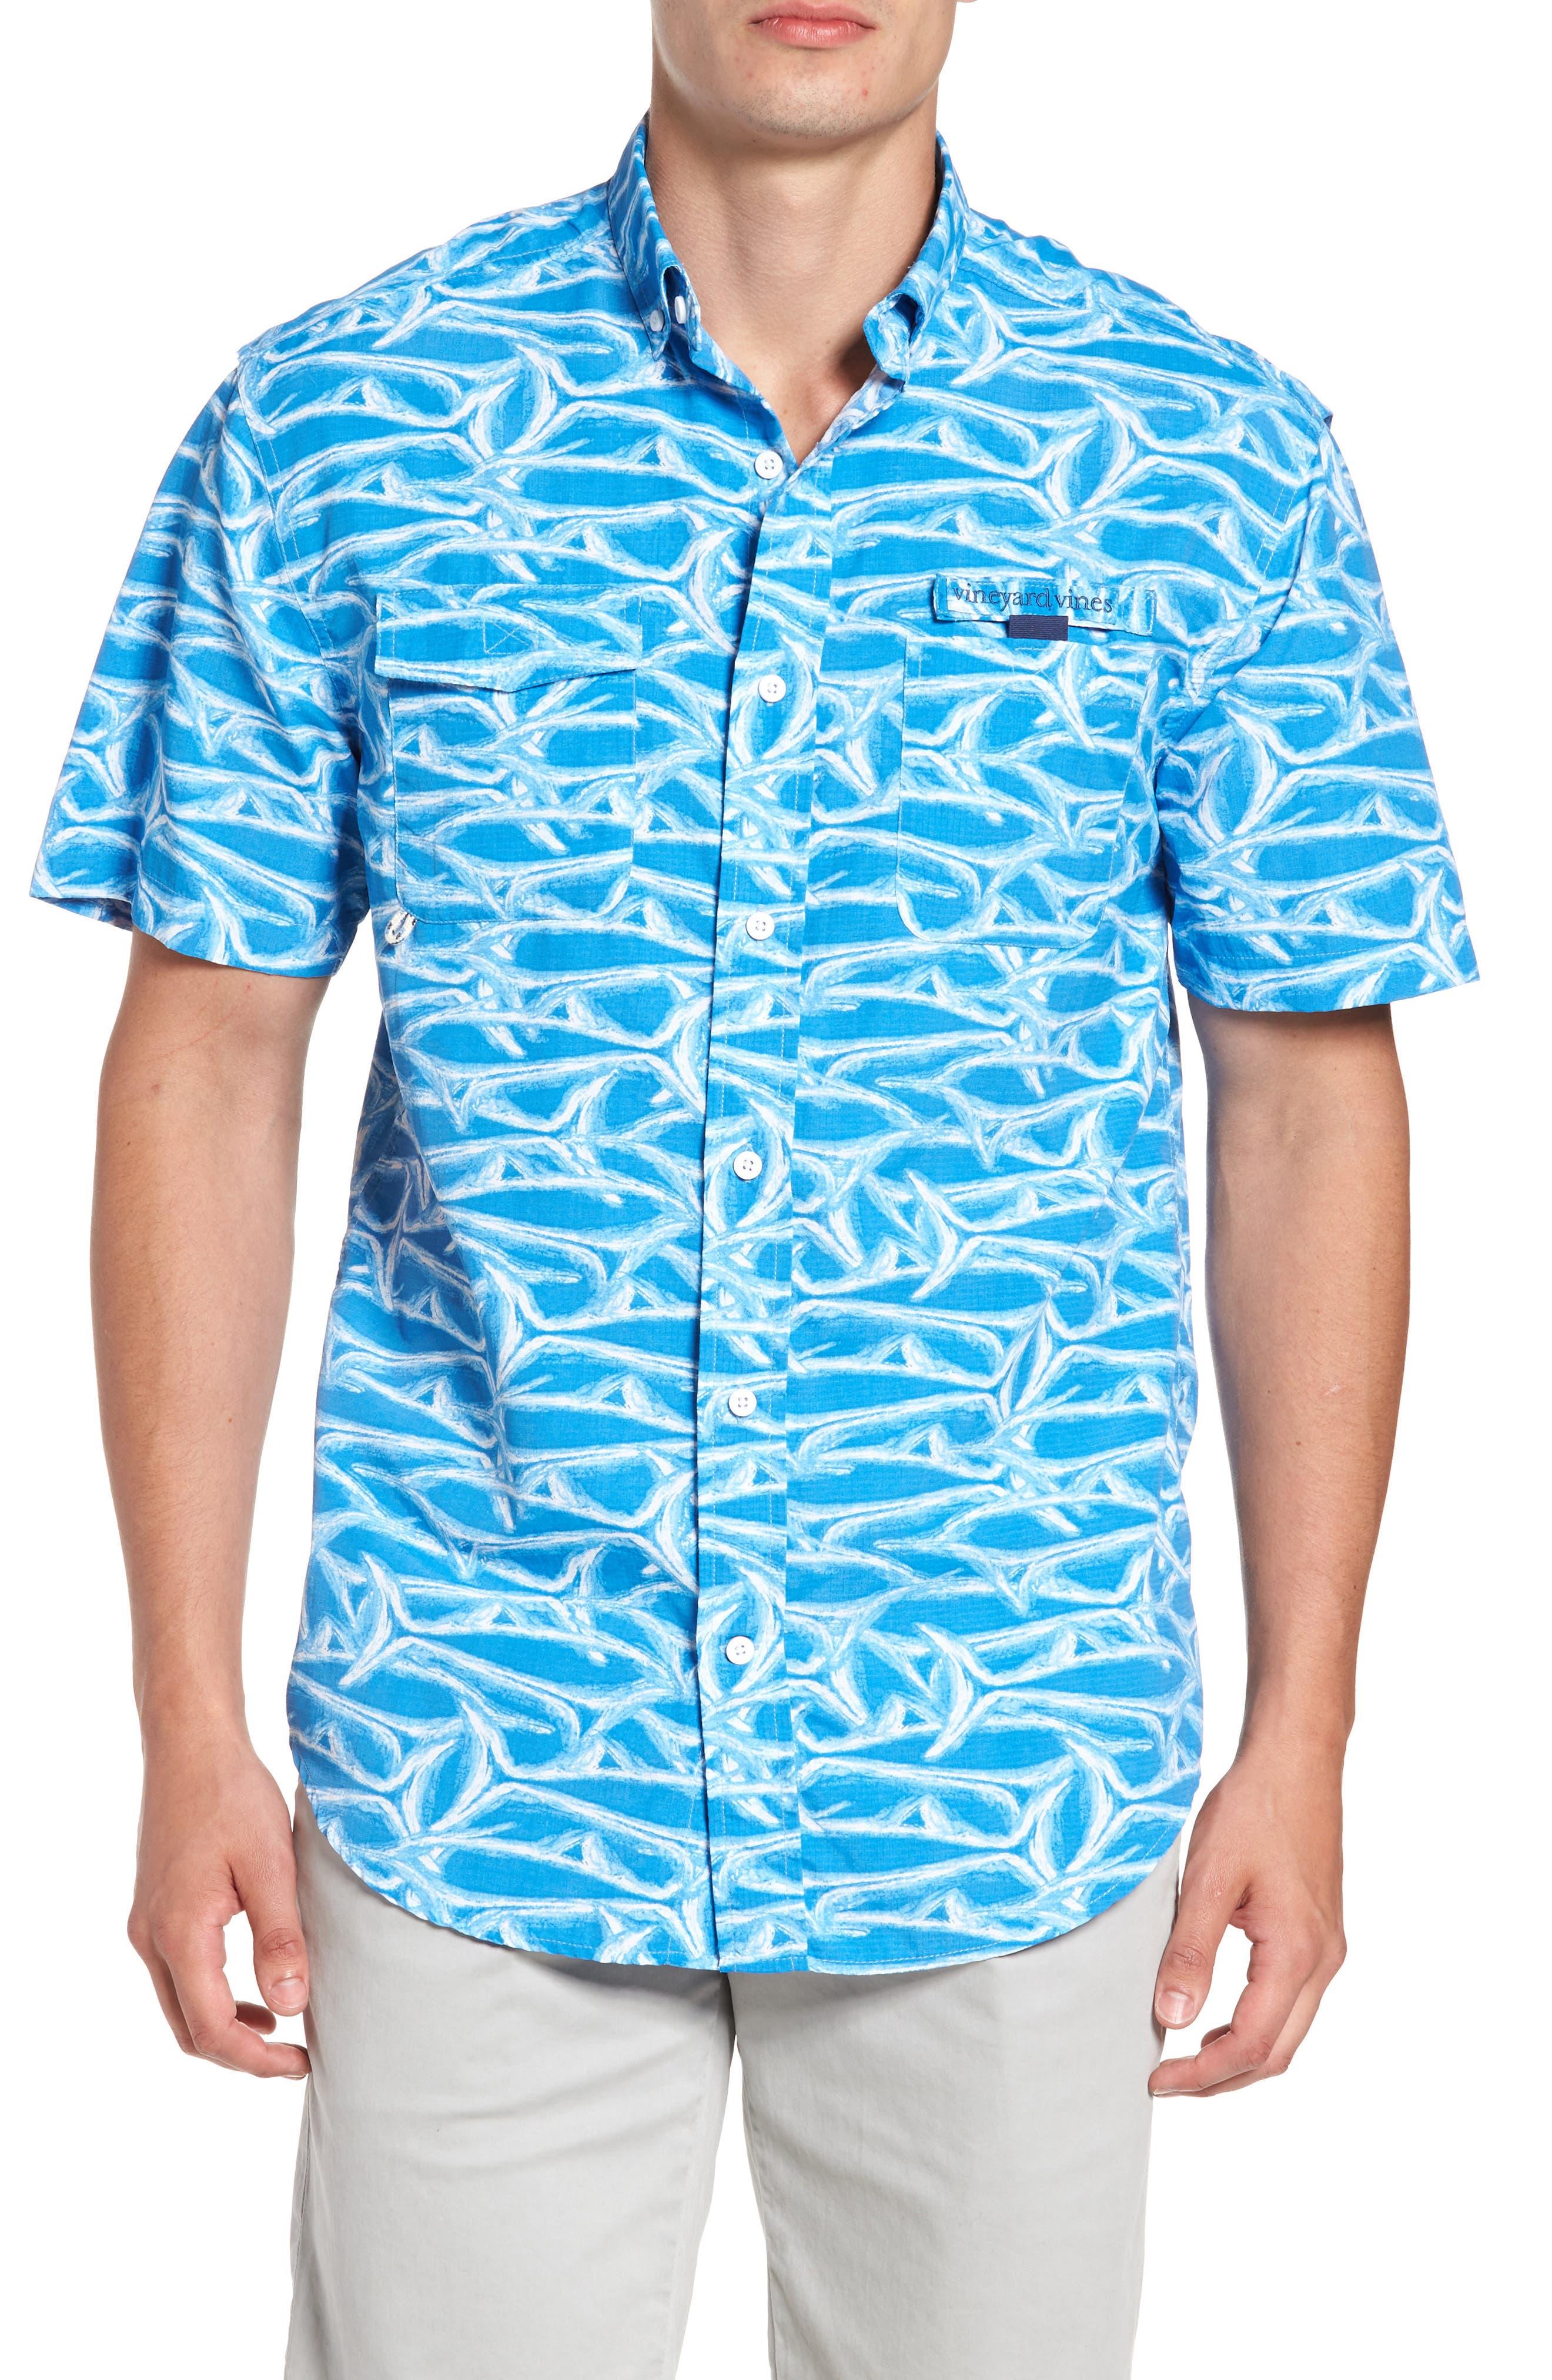 Main Image - vineyard vines Harbor Brushed Marlin Fishing Shirt